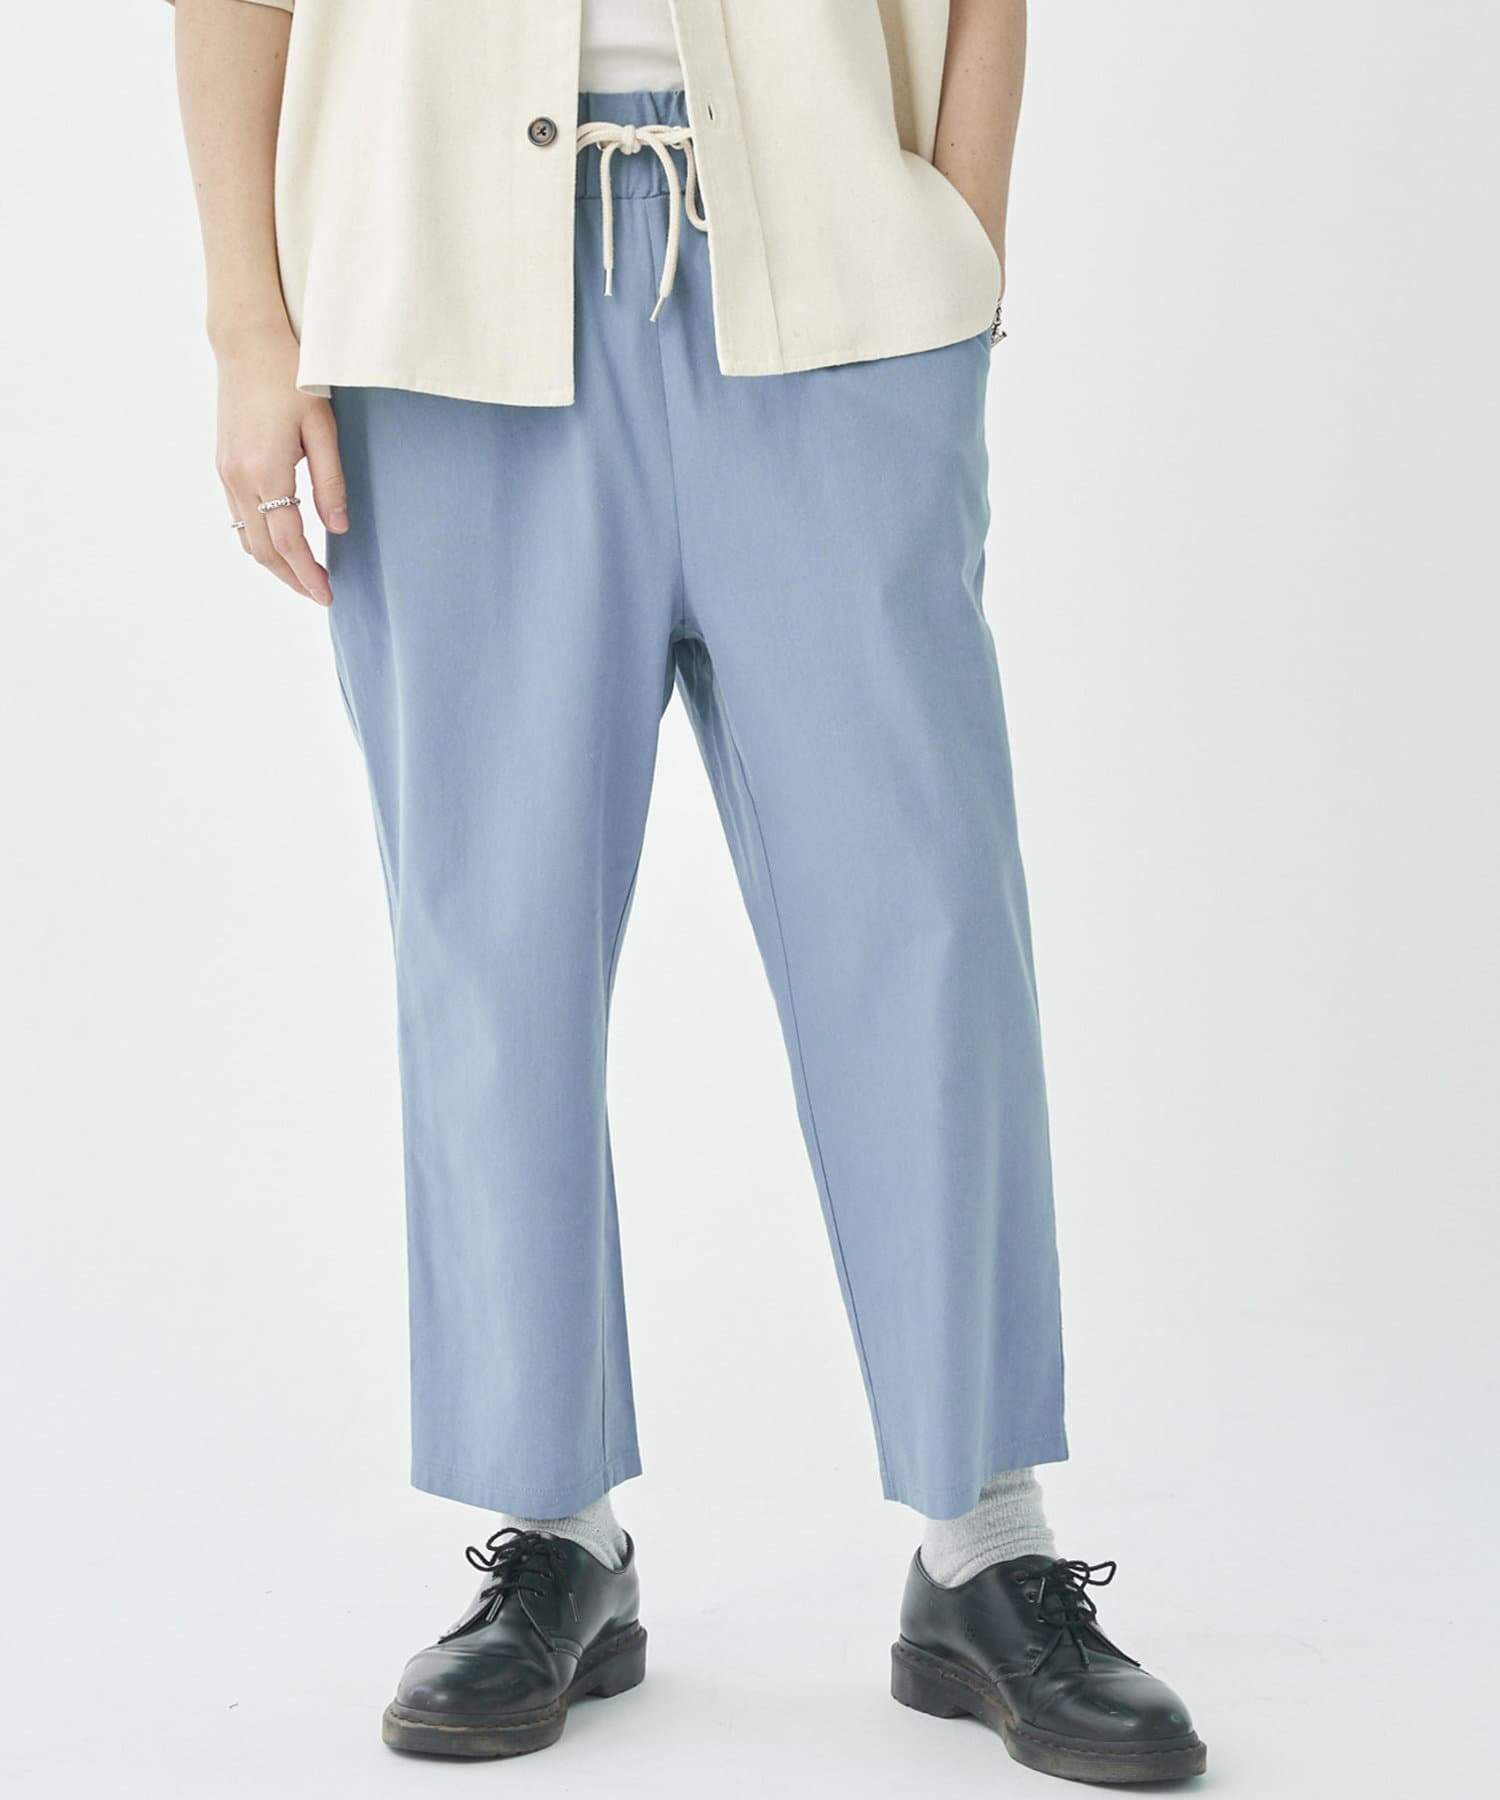 CPCM(シーピーシーエム) 綿レーヨンイージーワイドパンツ